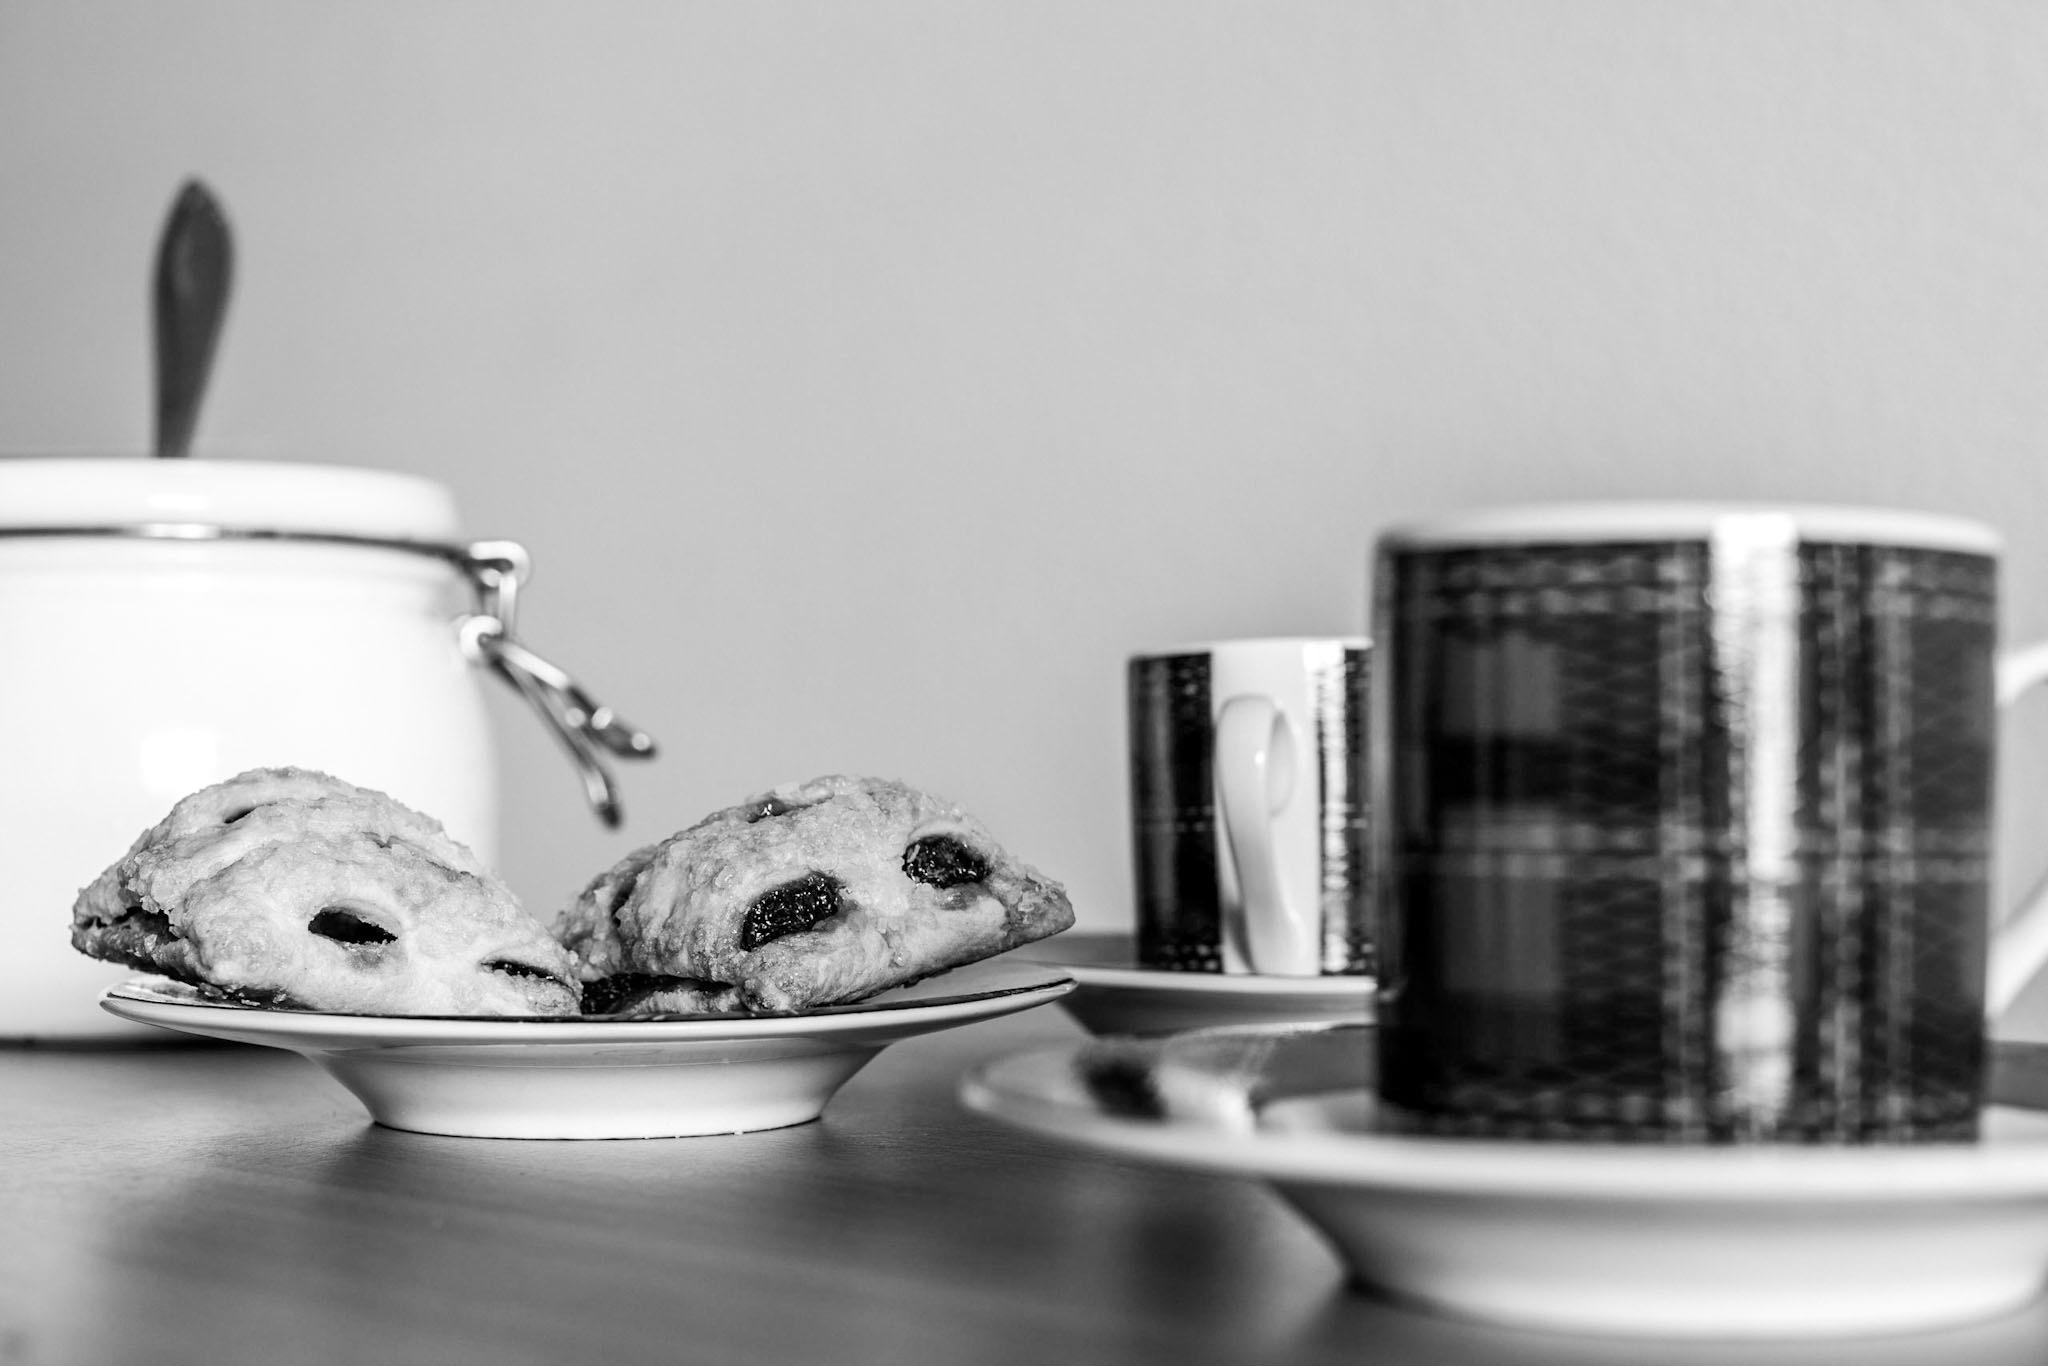 Coffee and Strudels  by Yazan Rahhal